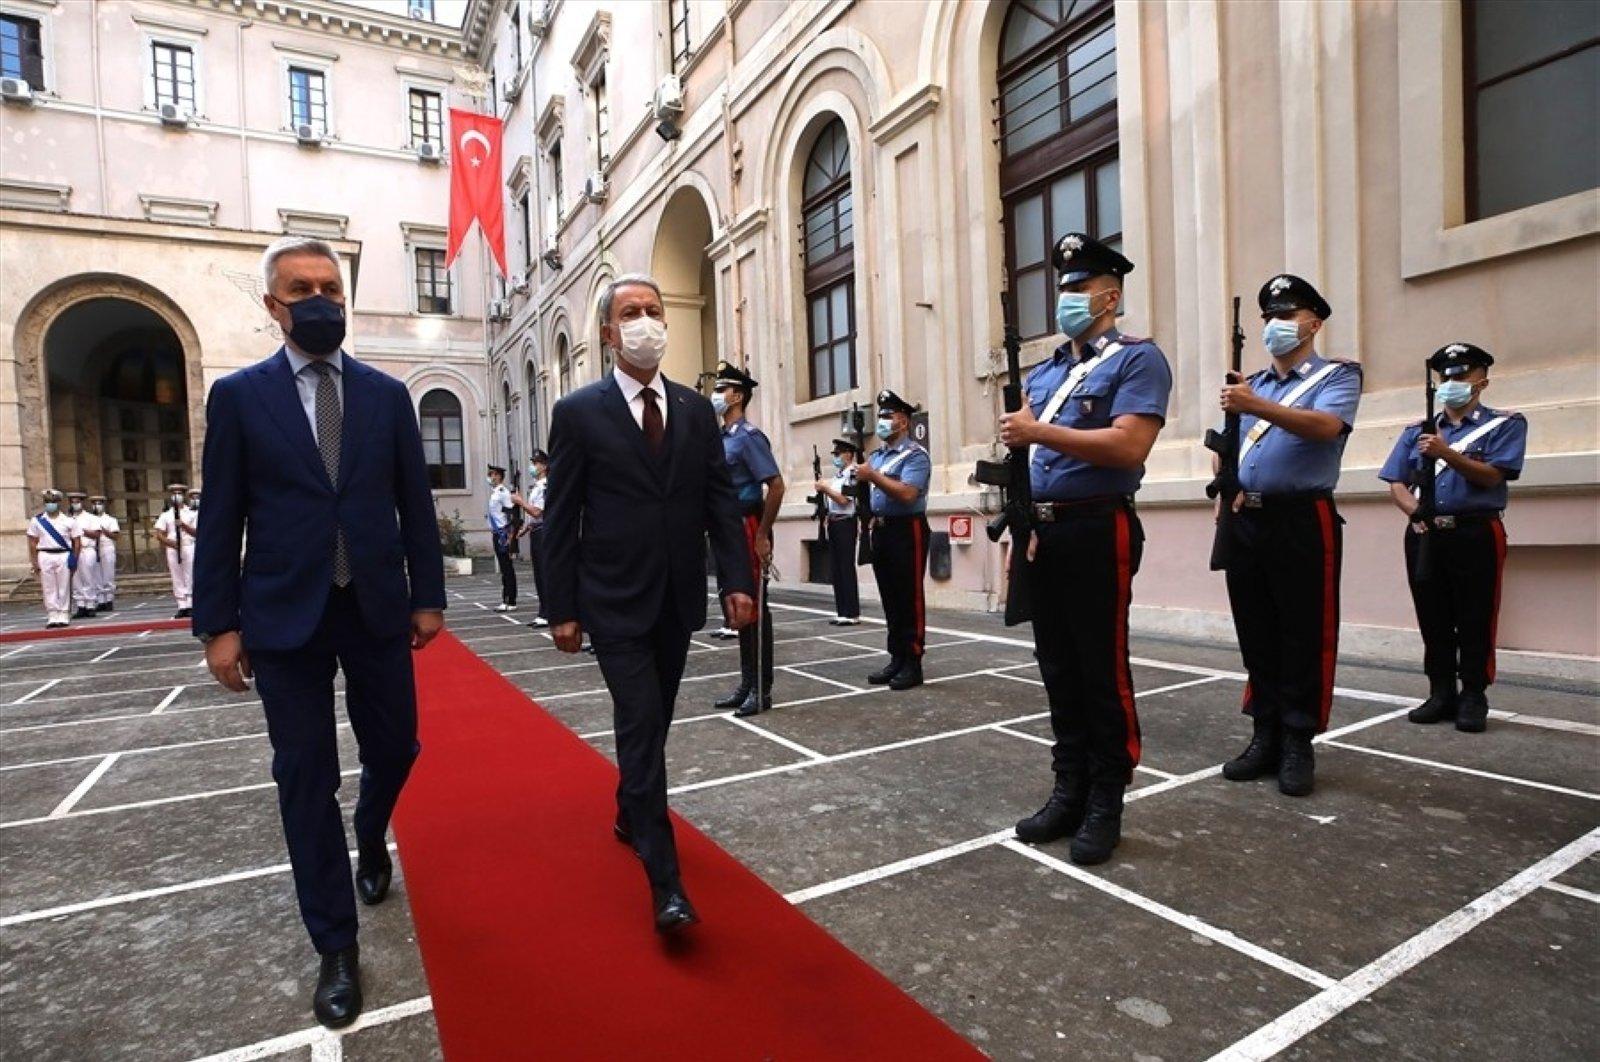 Turkish Defense Minister Hulusi Akar (R) walks beside his Italian counterpart Lorenzo Guerini during a military ceremony at the Italian Defense Ministry, Rome, Italy, Oct. 9, 2020. (IHA Photo)